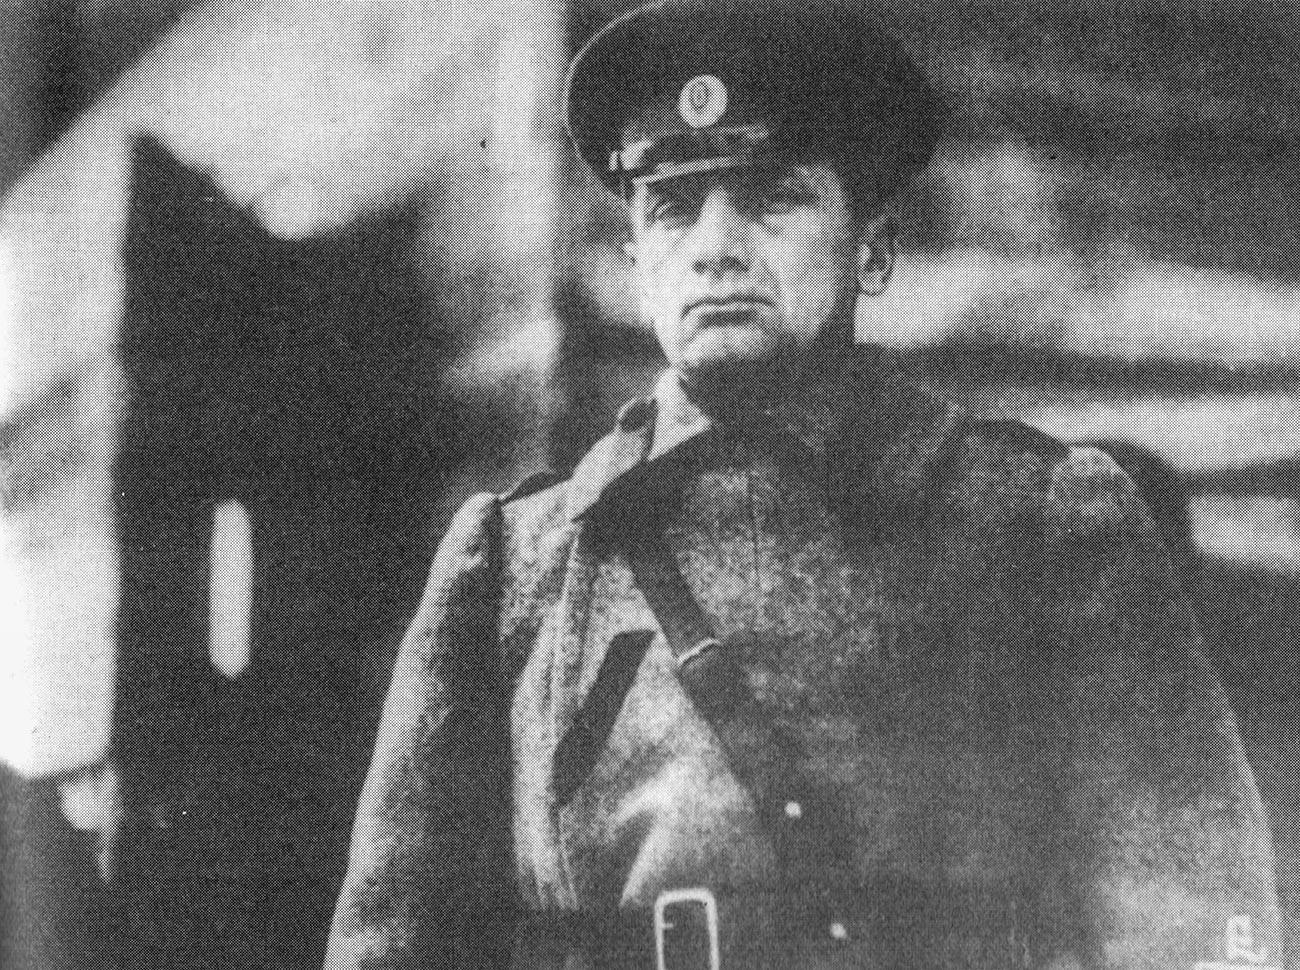 Alexandre Koltchak